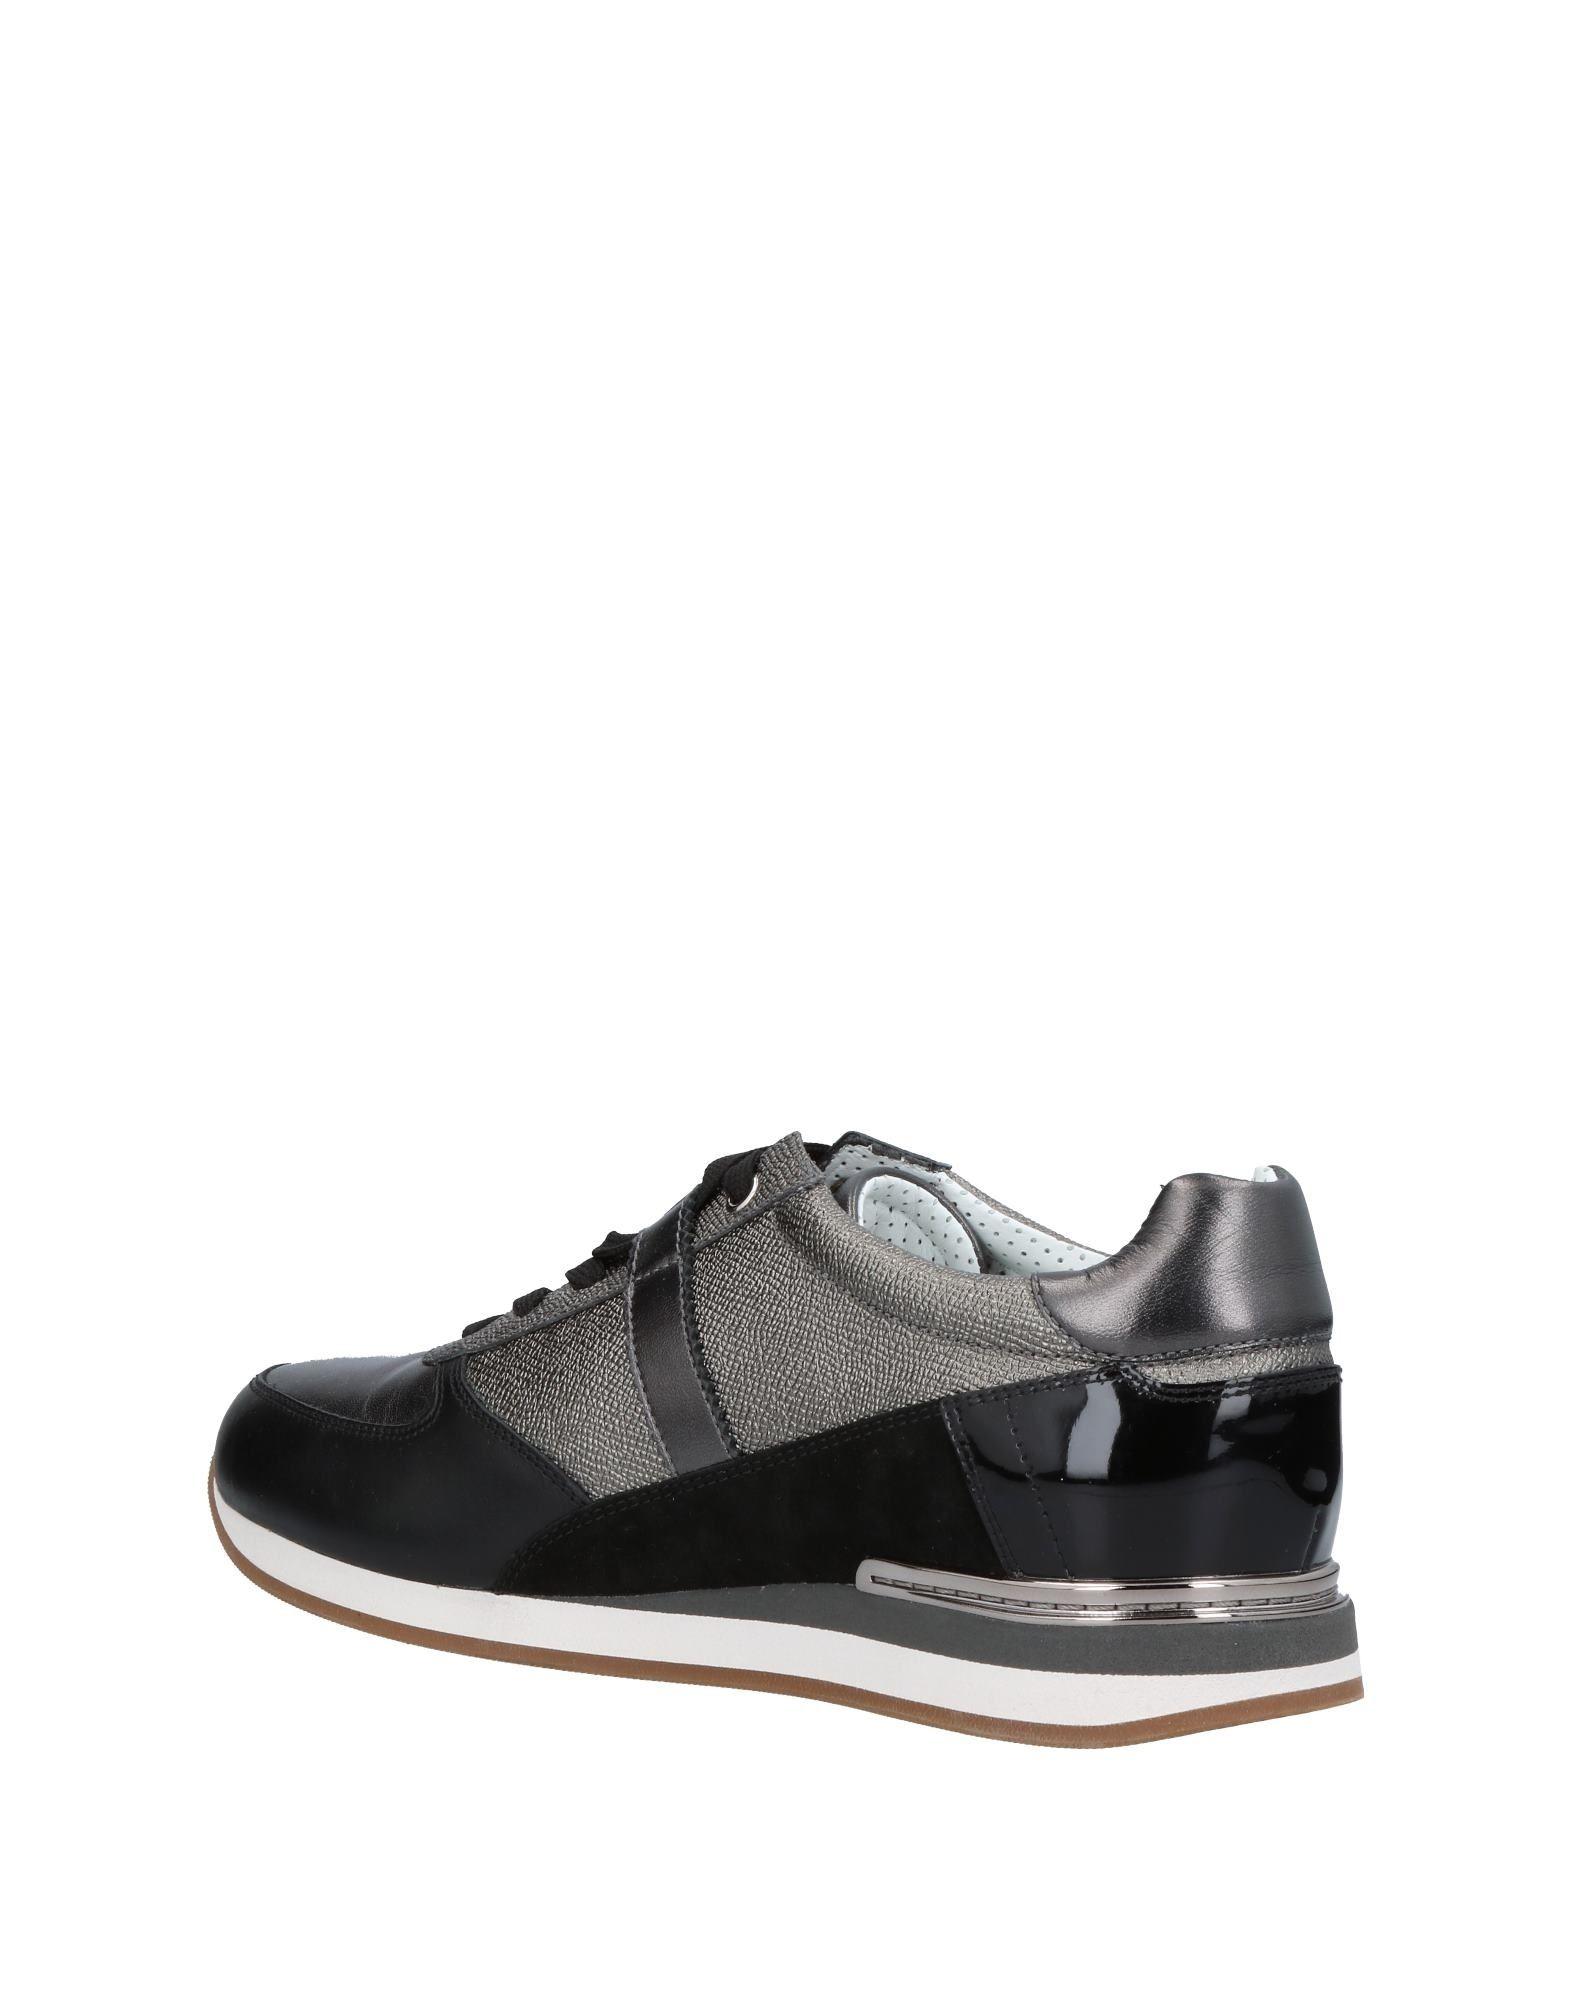 Dolce & Gabbana Sneakers - Men Dolce Dolce Dolce & Gabbana Sneakers online on  Australia - 11366273TG a95423